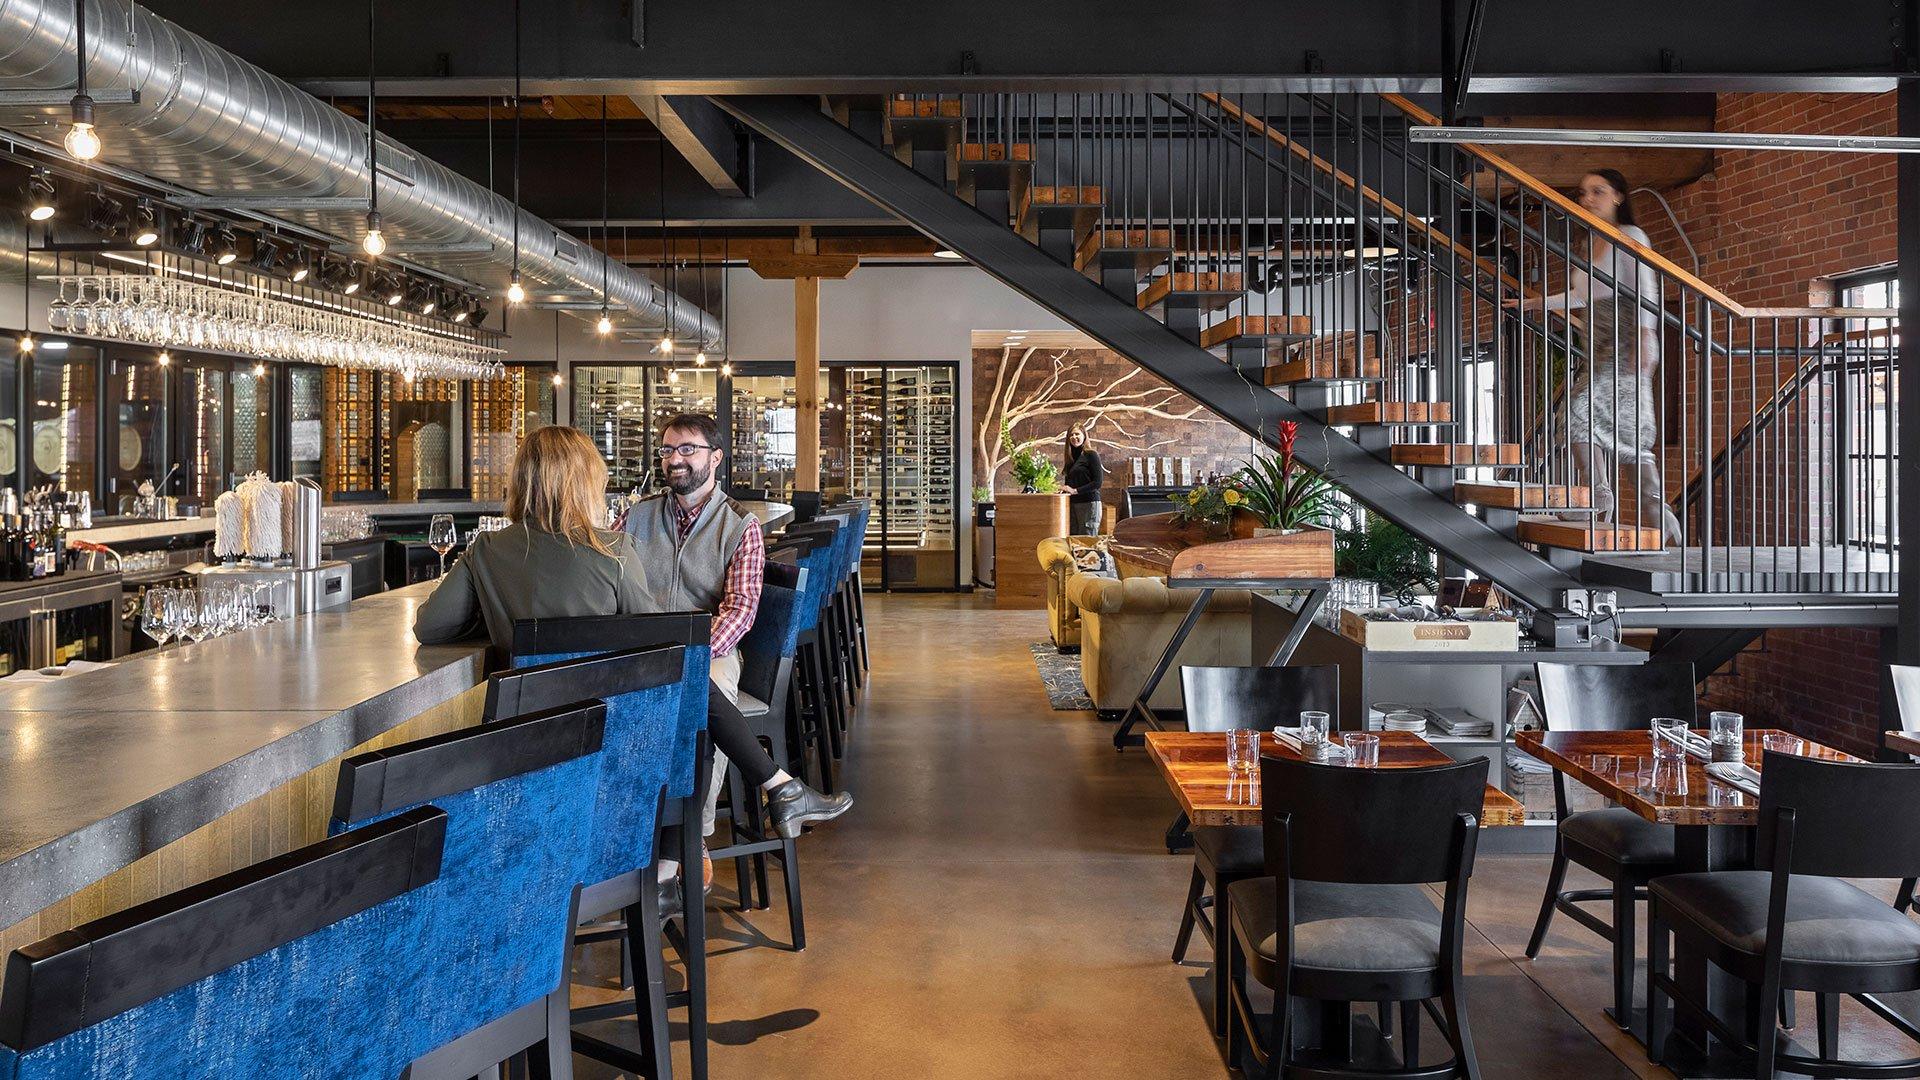 Urban Wren, Winery + Restaurant